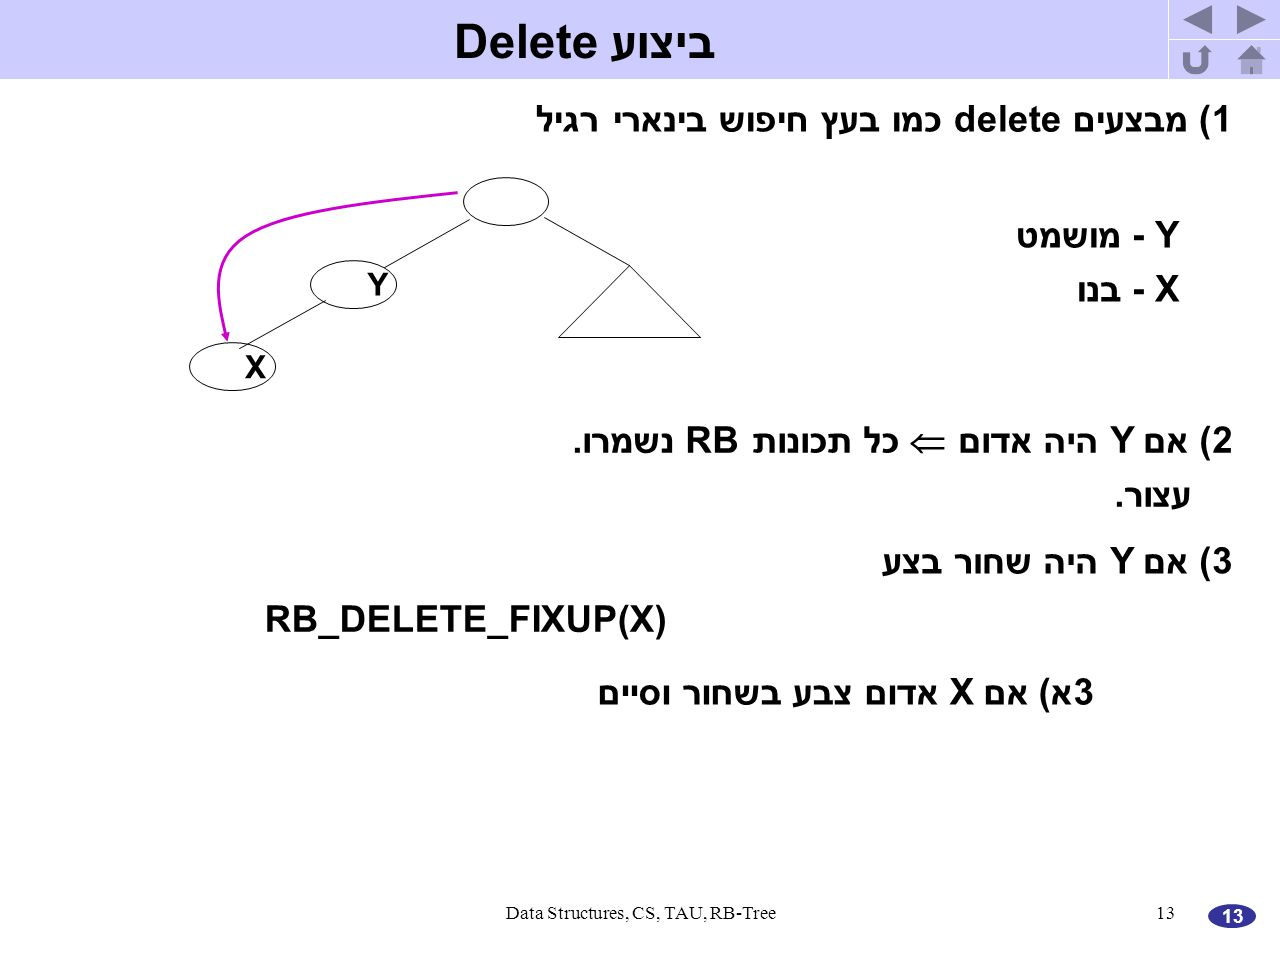 13 Data Structures, CS, TAU, RB-Tree13 ביצוע Delete 1) מבצעים delete כמו בעץ חיפוש בינארי רגיל Y X Y - מושמט X - בנו 2) אם Y היה אדום  כל תכונות RB נשמרו.